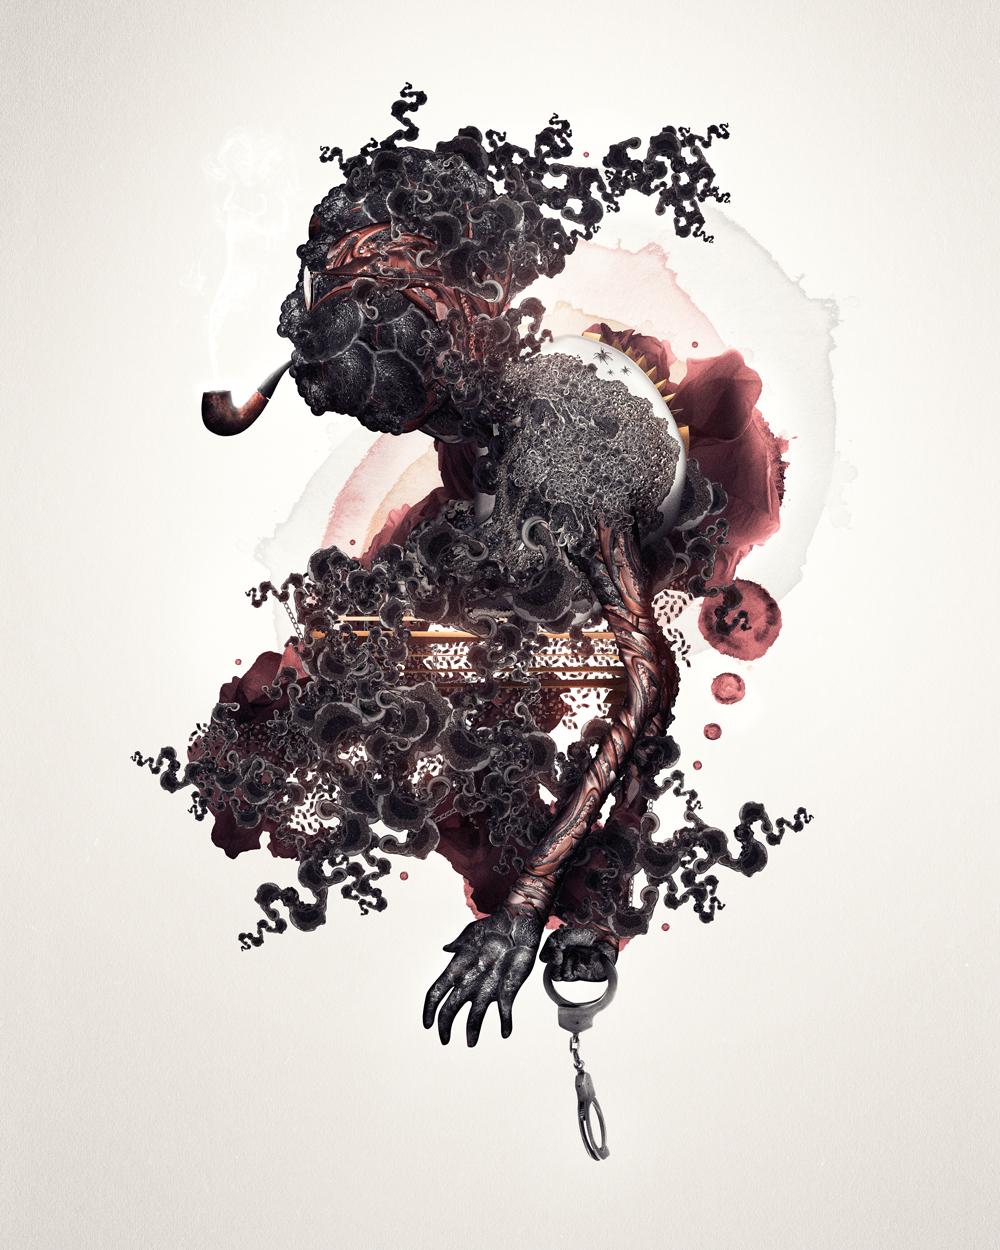 Artist: Niklas Lundburg